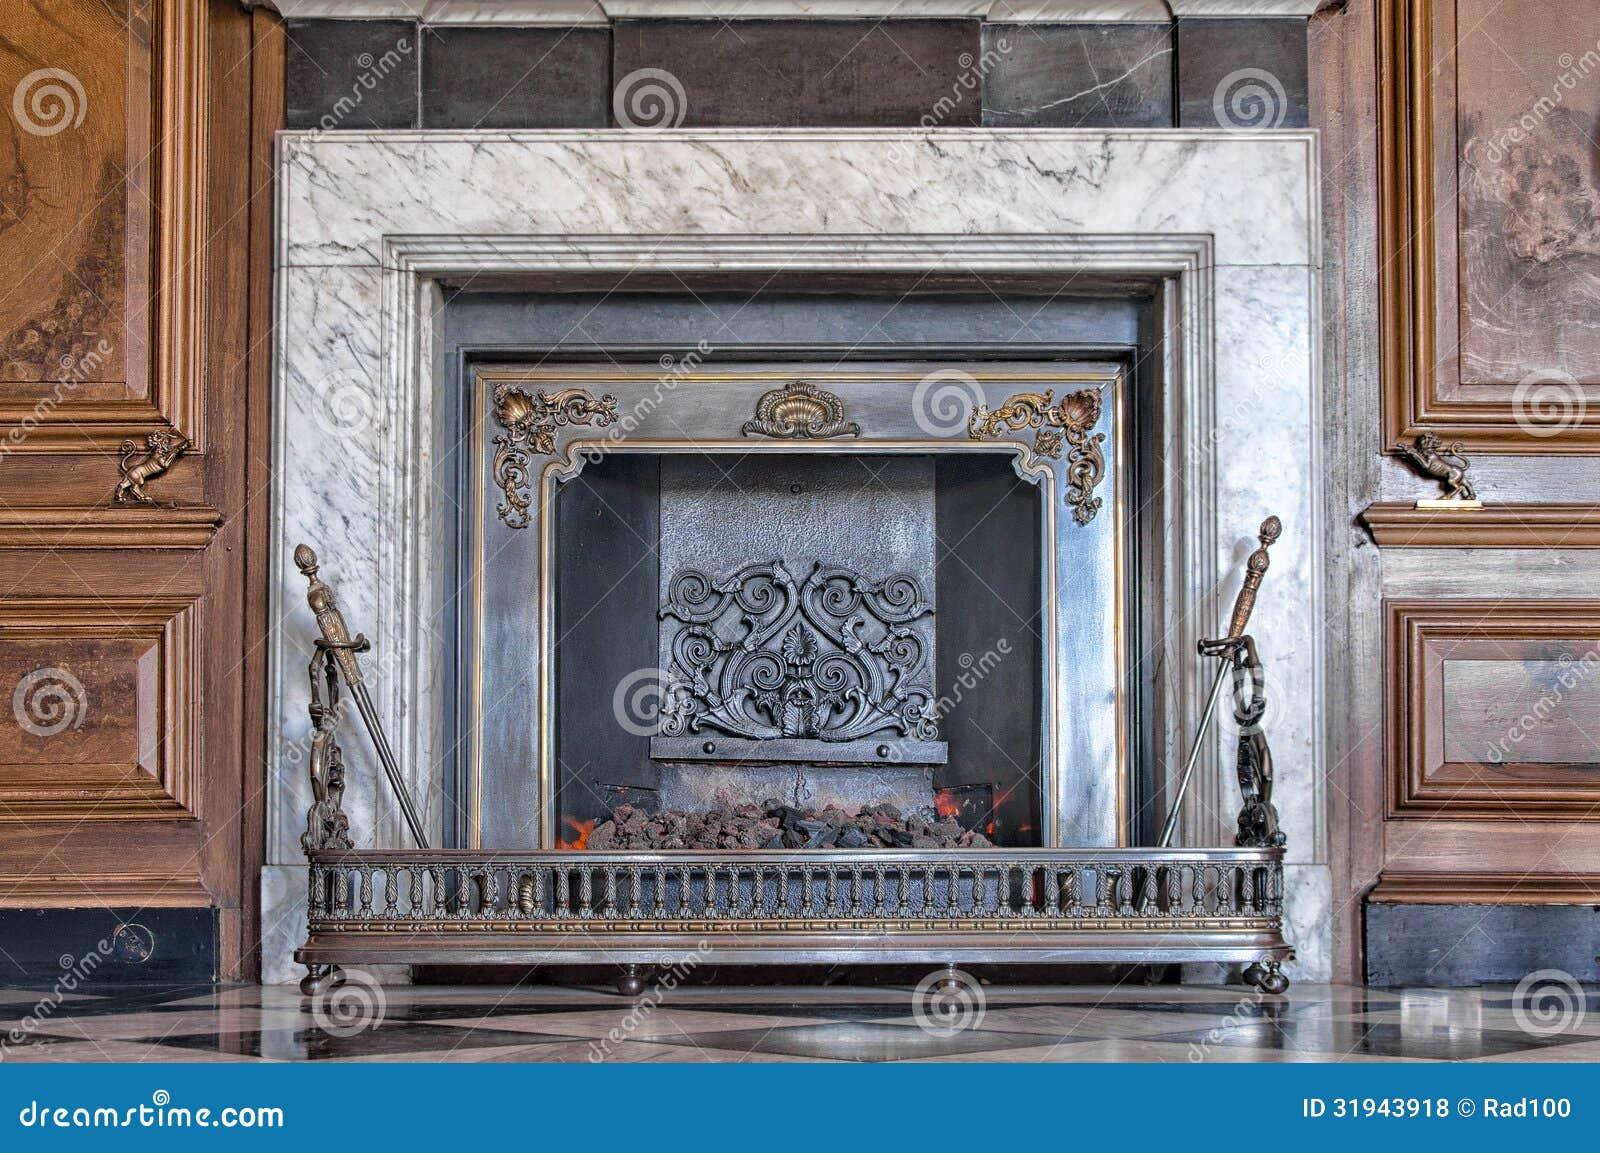 Fireplace With Burning Coal Stock Photo Image Of Fireplace